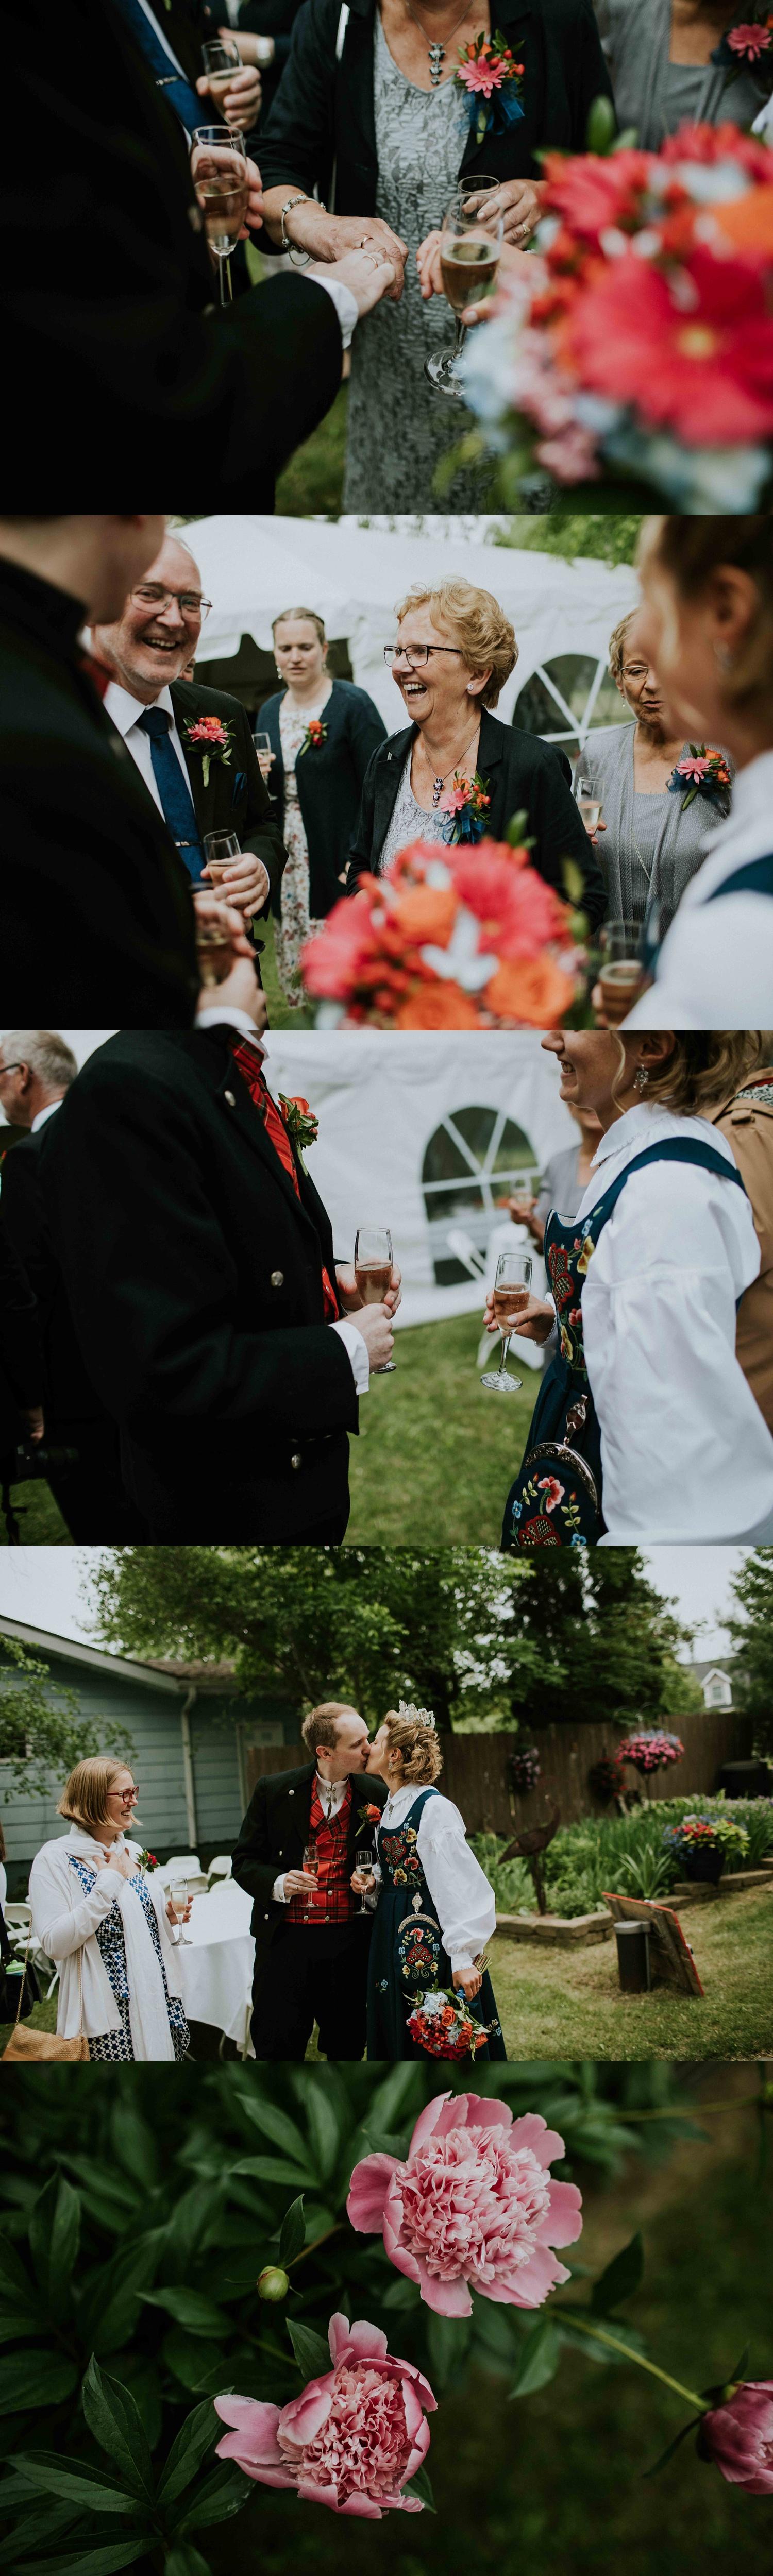 Norwegian Wedding Stevens Point Wisconsin Wedding Photographer Chloe Ann Photography_0020.jpg